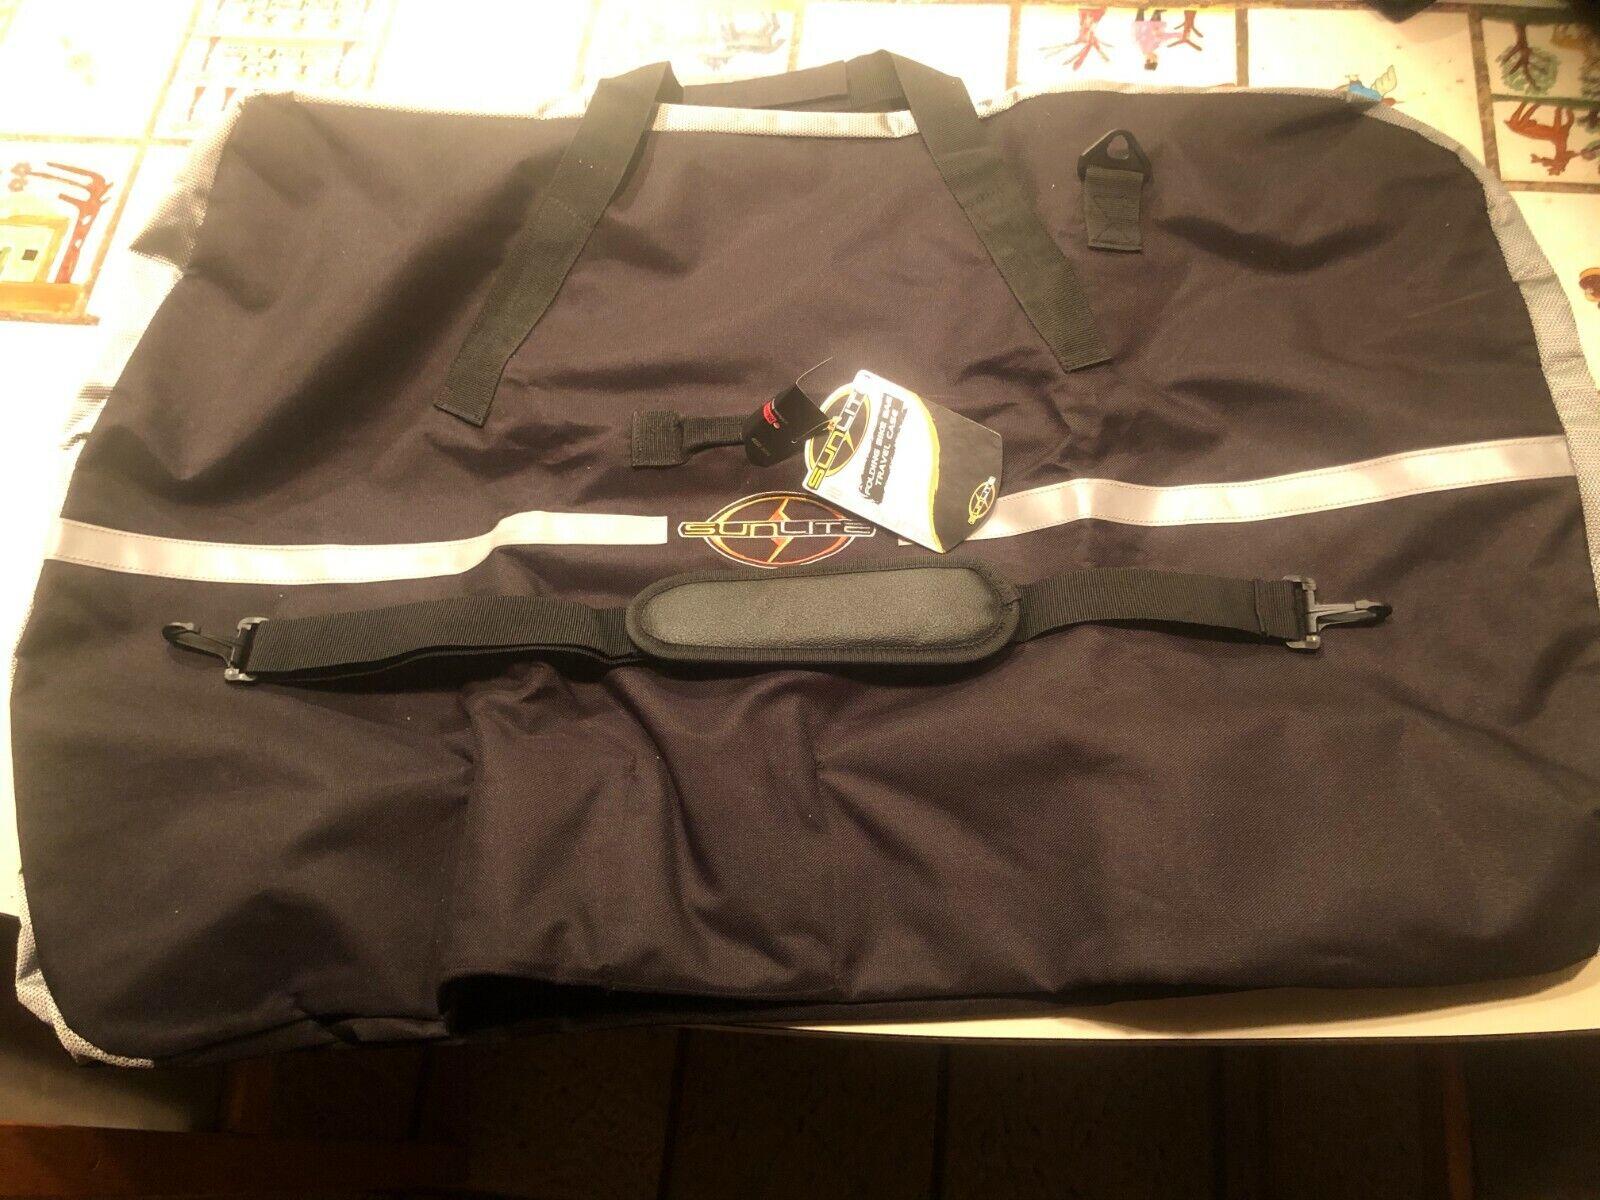 SUNLITE 20 FOLDING BIKE BAG TRAVELING CASE 24X37X11